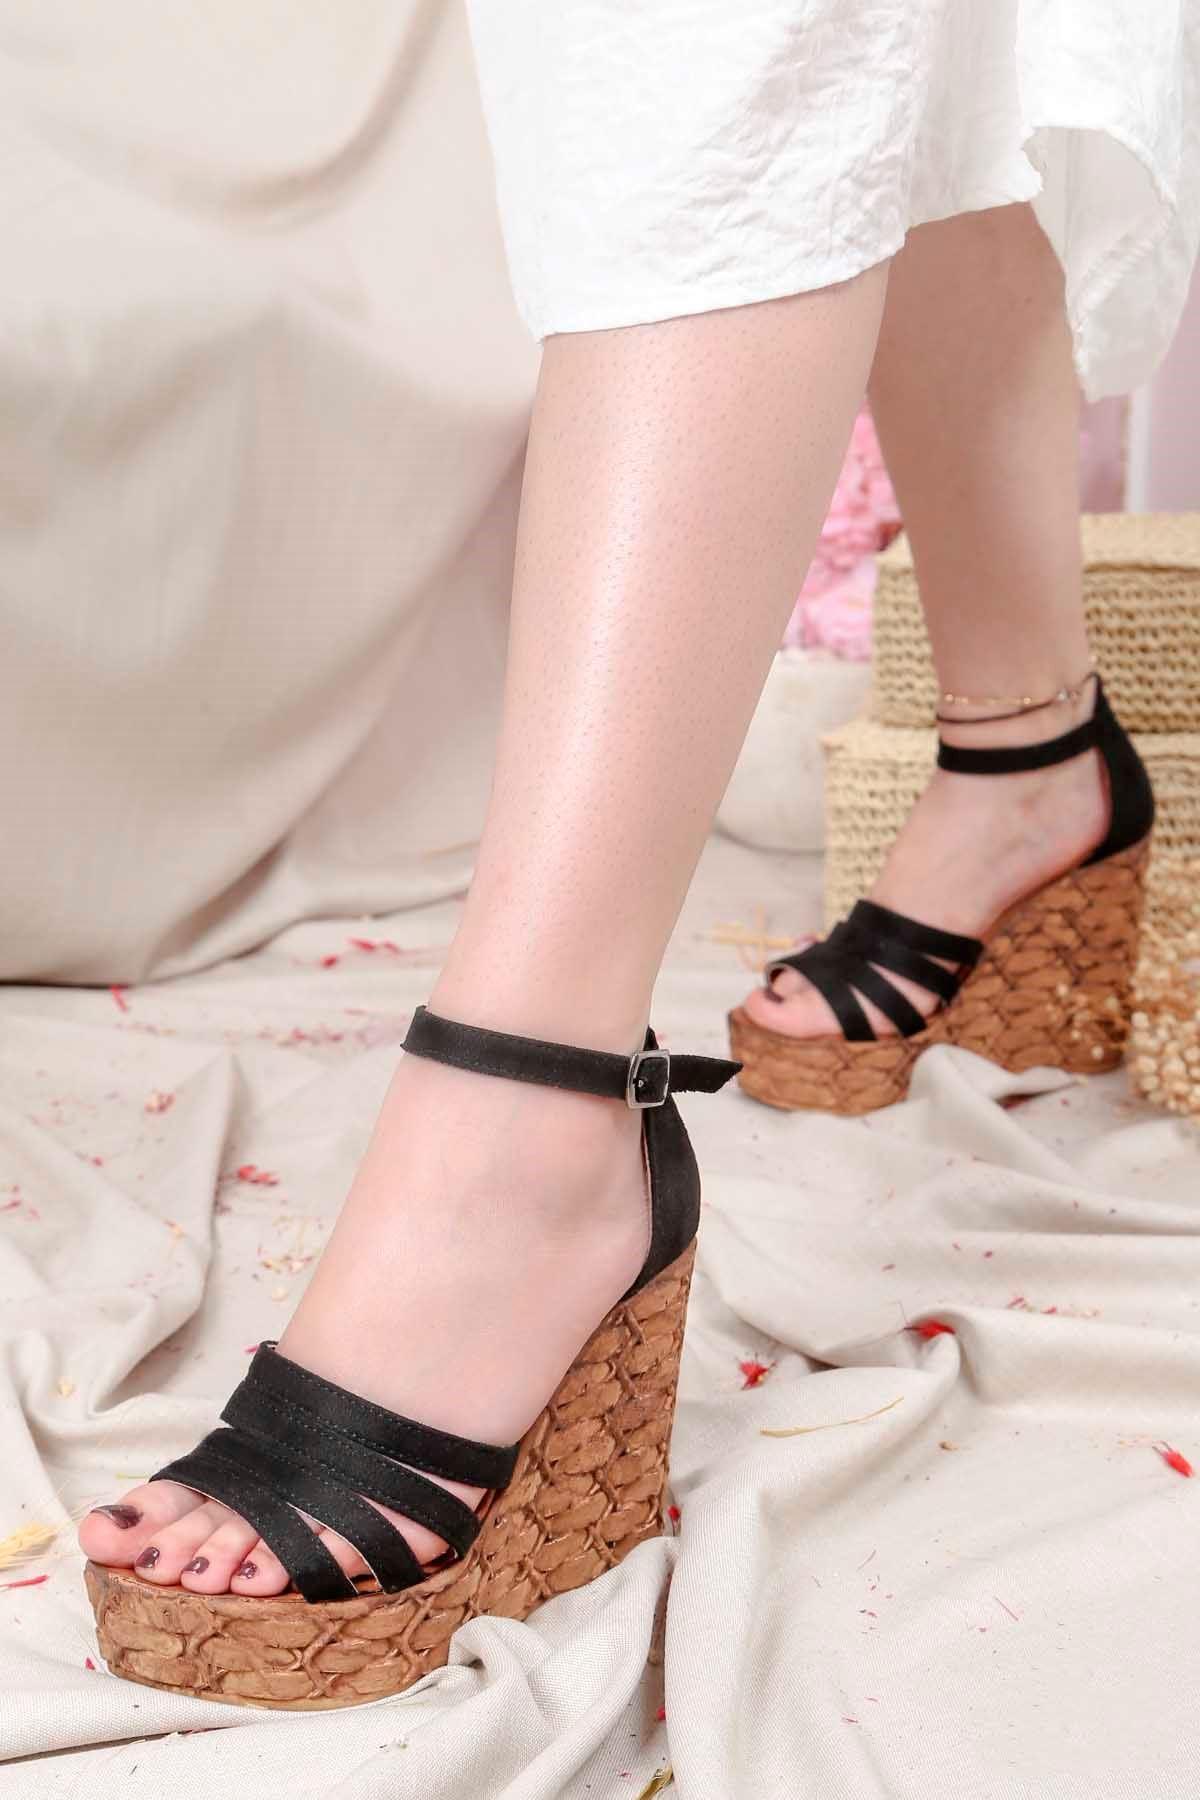 Frm-004 Yüksek Taban Sandalet Siyah Süet